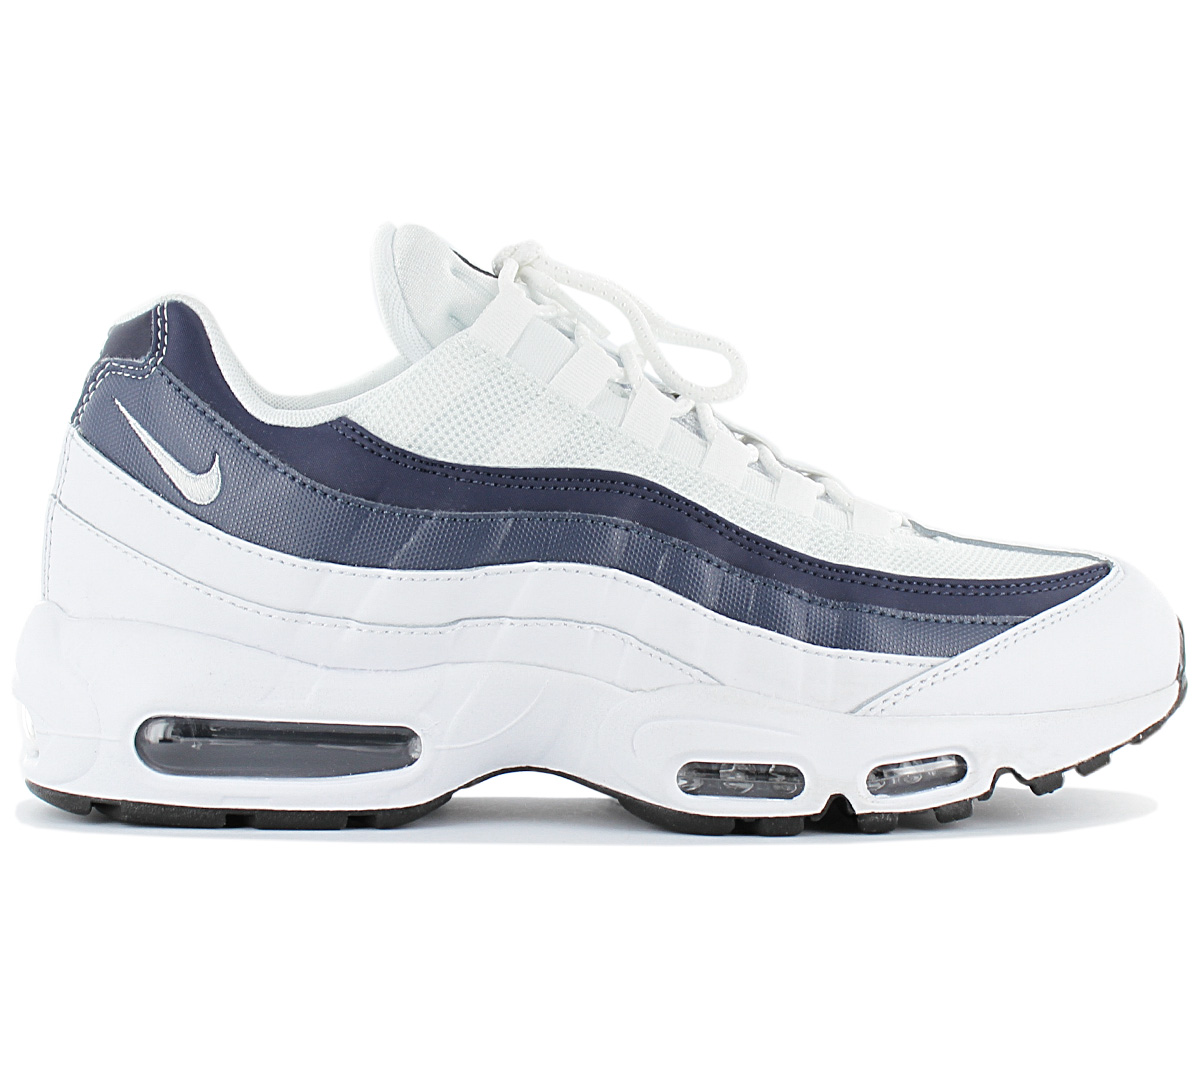 Details zu Nike Air Max 95 Essential Herren Fashion Sneaker 749766 114 Weiß Schuhe NEU